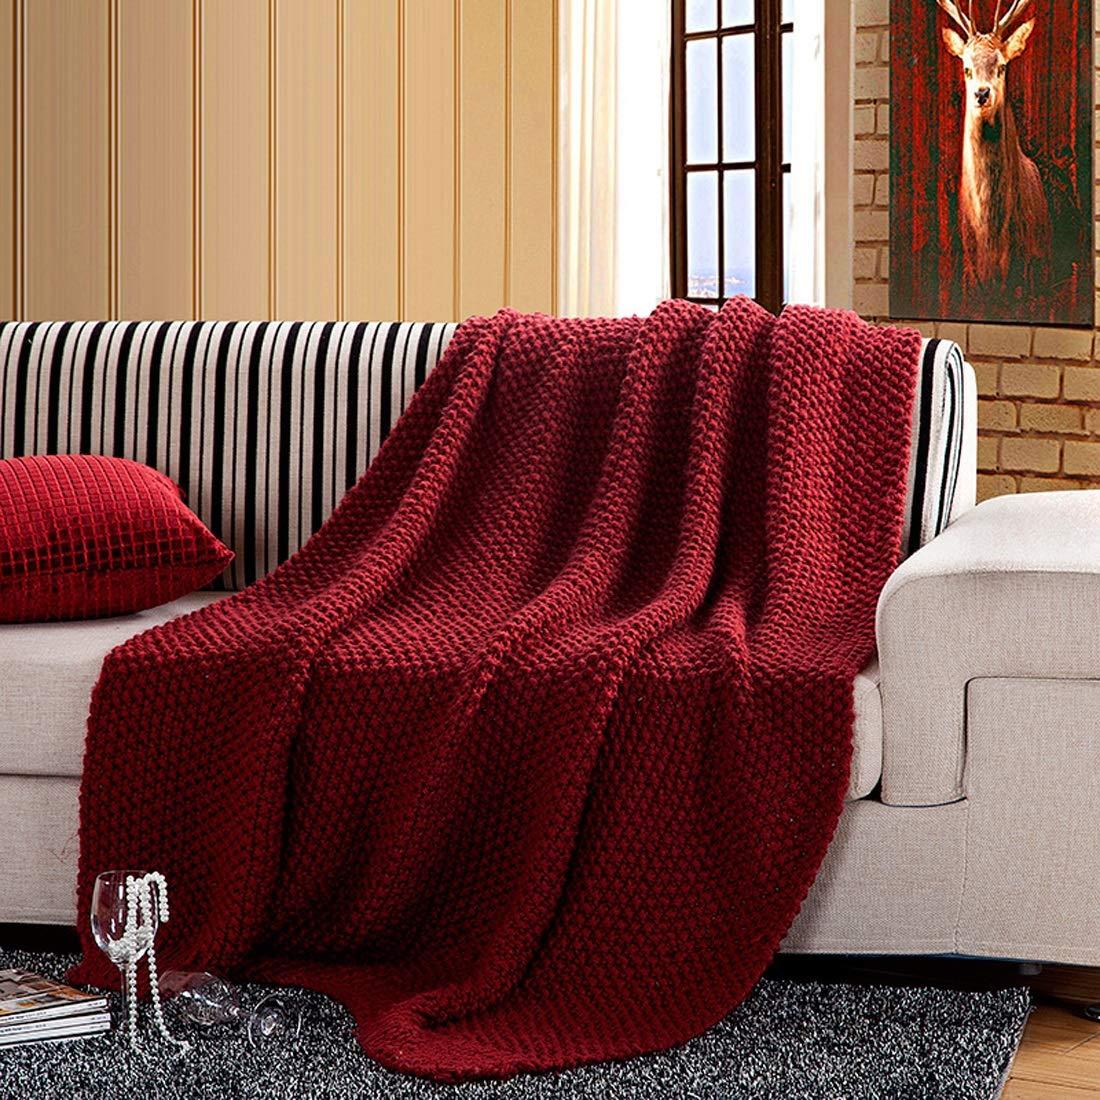 OWNFSKNL 毛布スレッドマニュアルホームソファに適した軽量のソファデコレーションカバータオルを編む (Color : レッド) B07MYMCHJS レッド